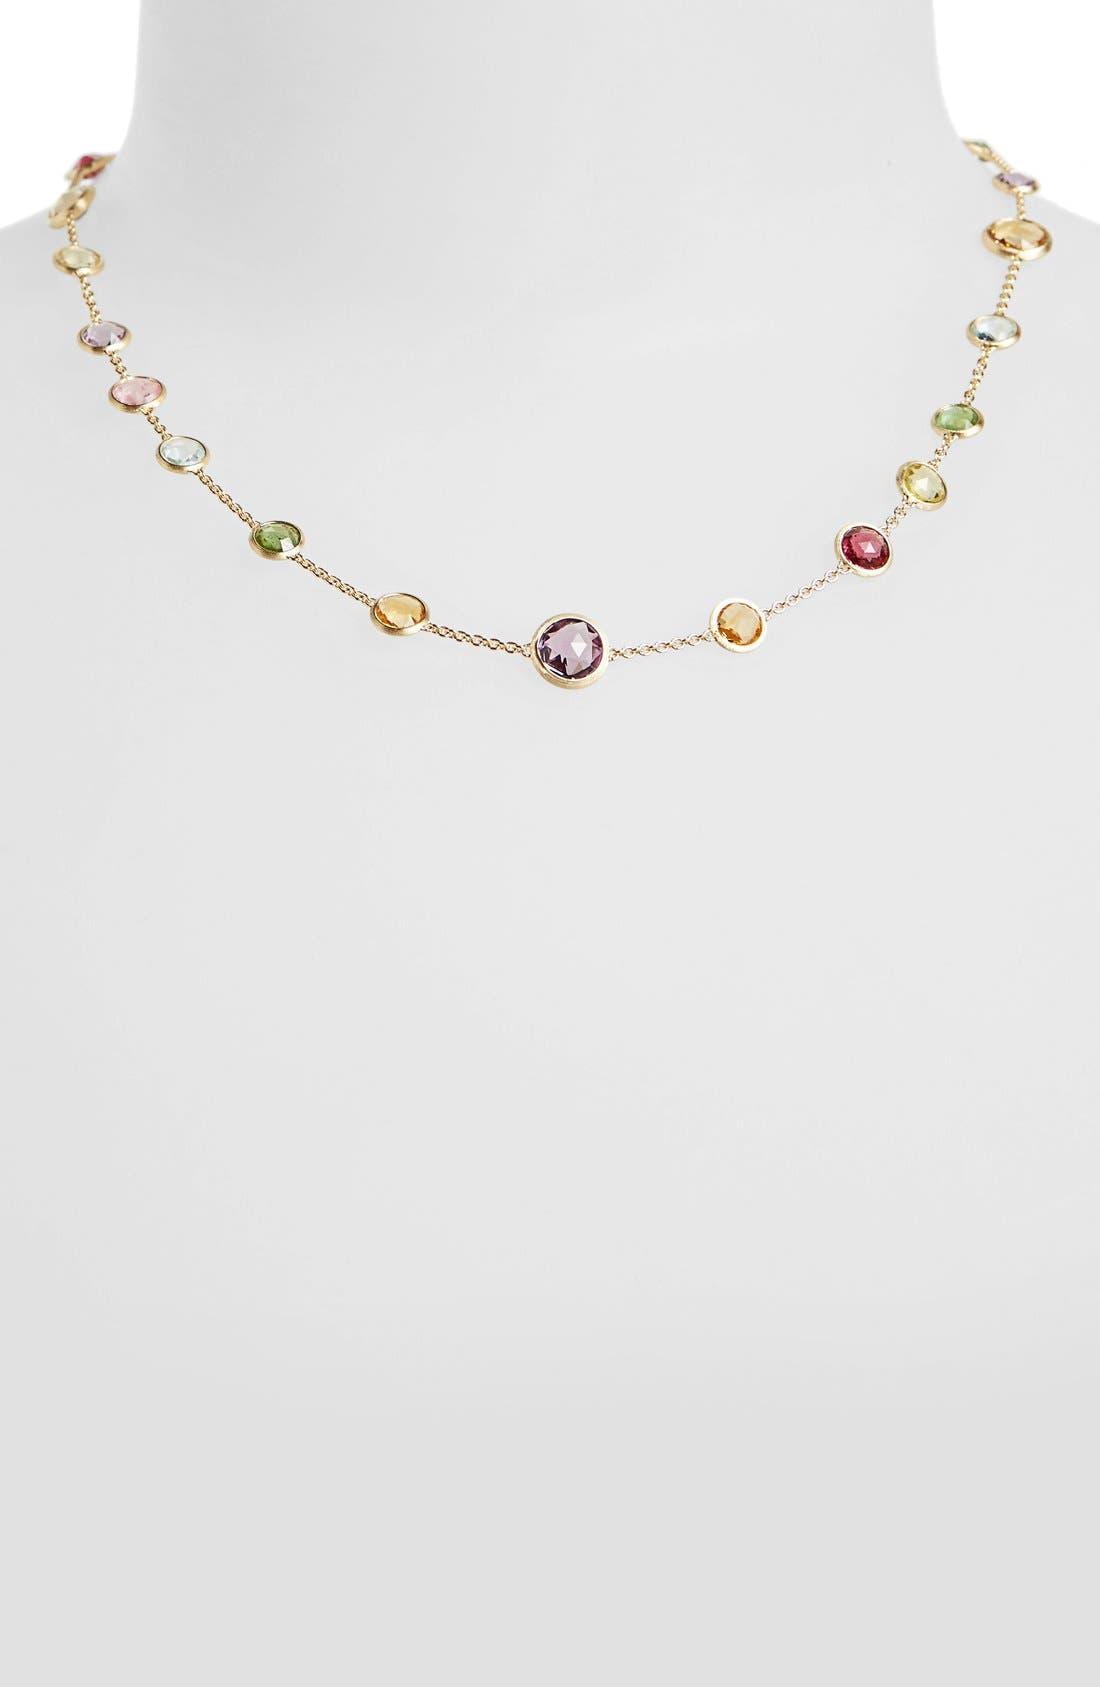 Alternate Image 1 Selected - Marco Bicego 'Mini Jaipur' Station Necklace